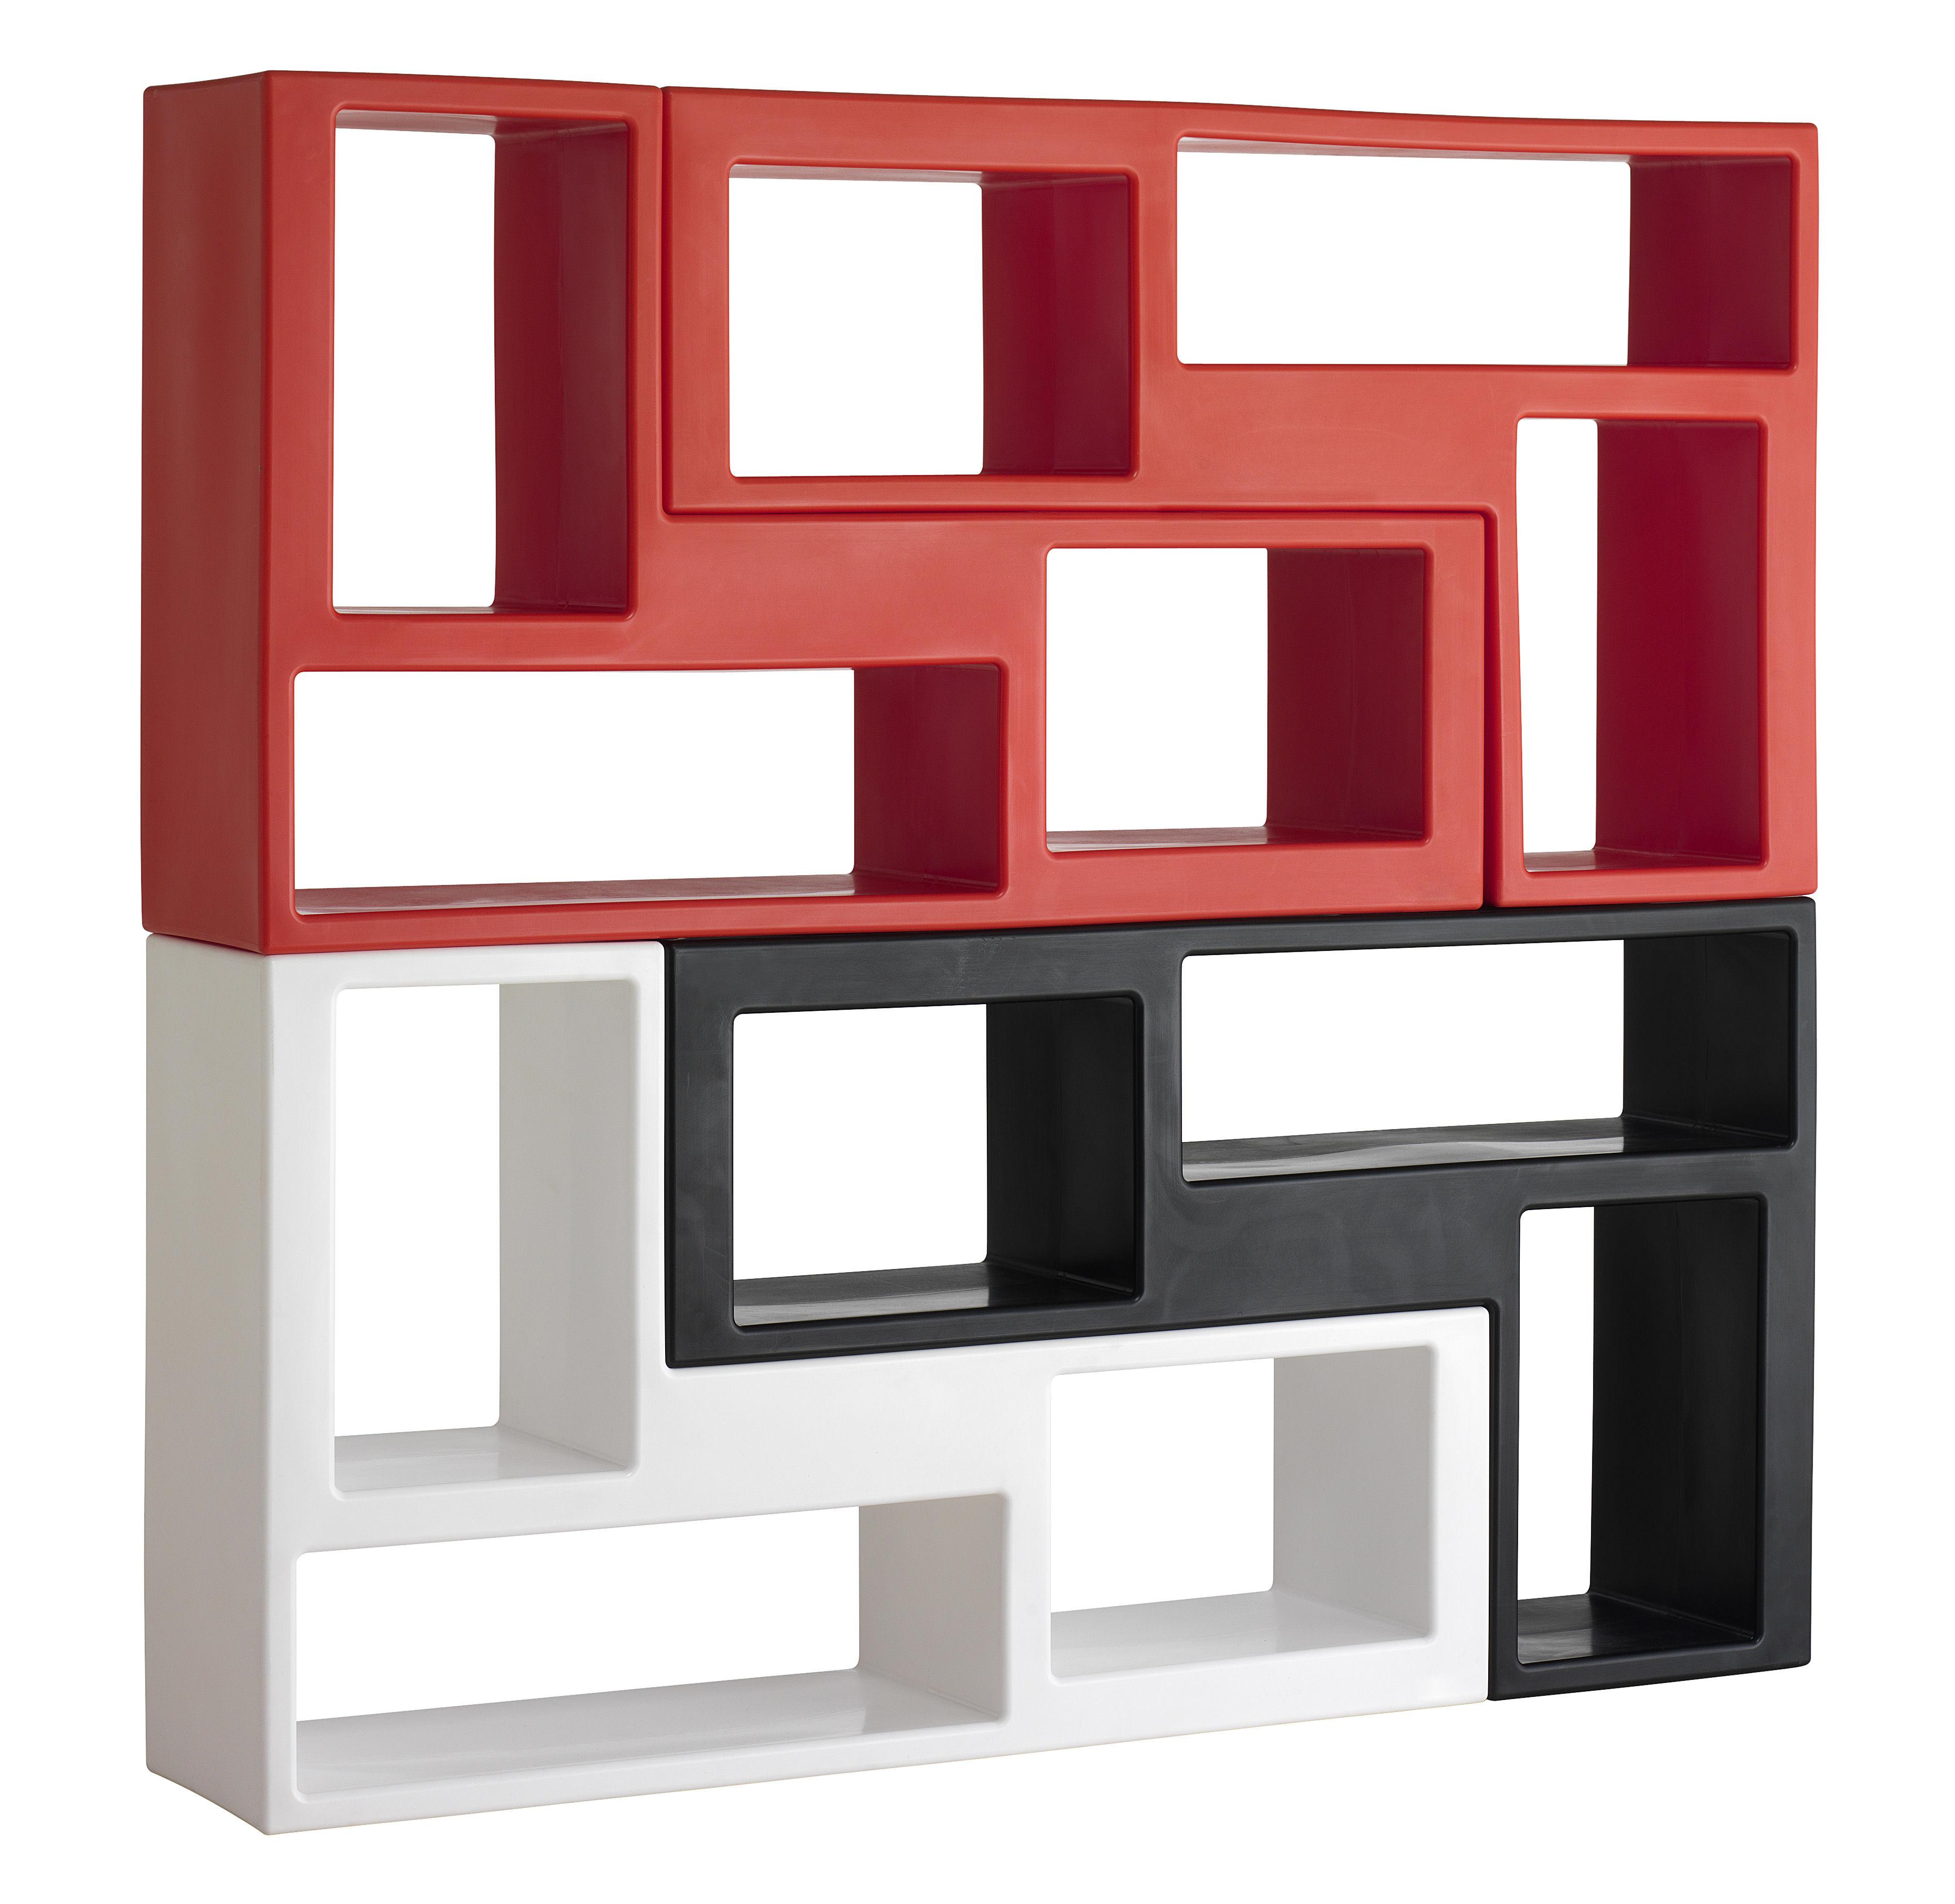 Bookshelf Furniture Design 3786 x 3688